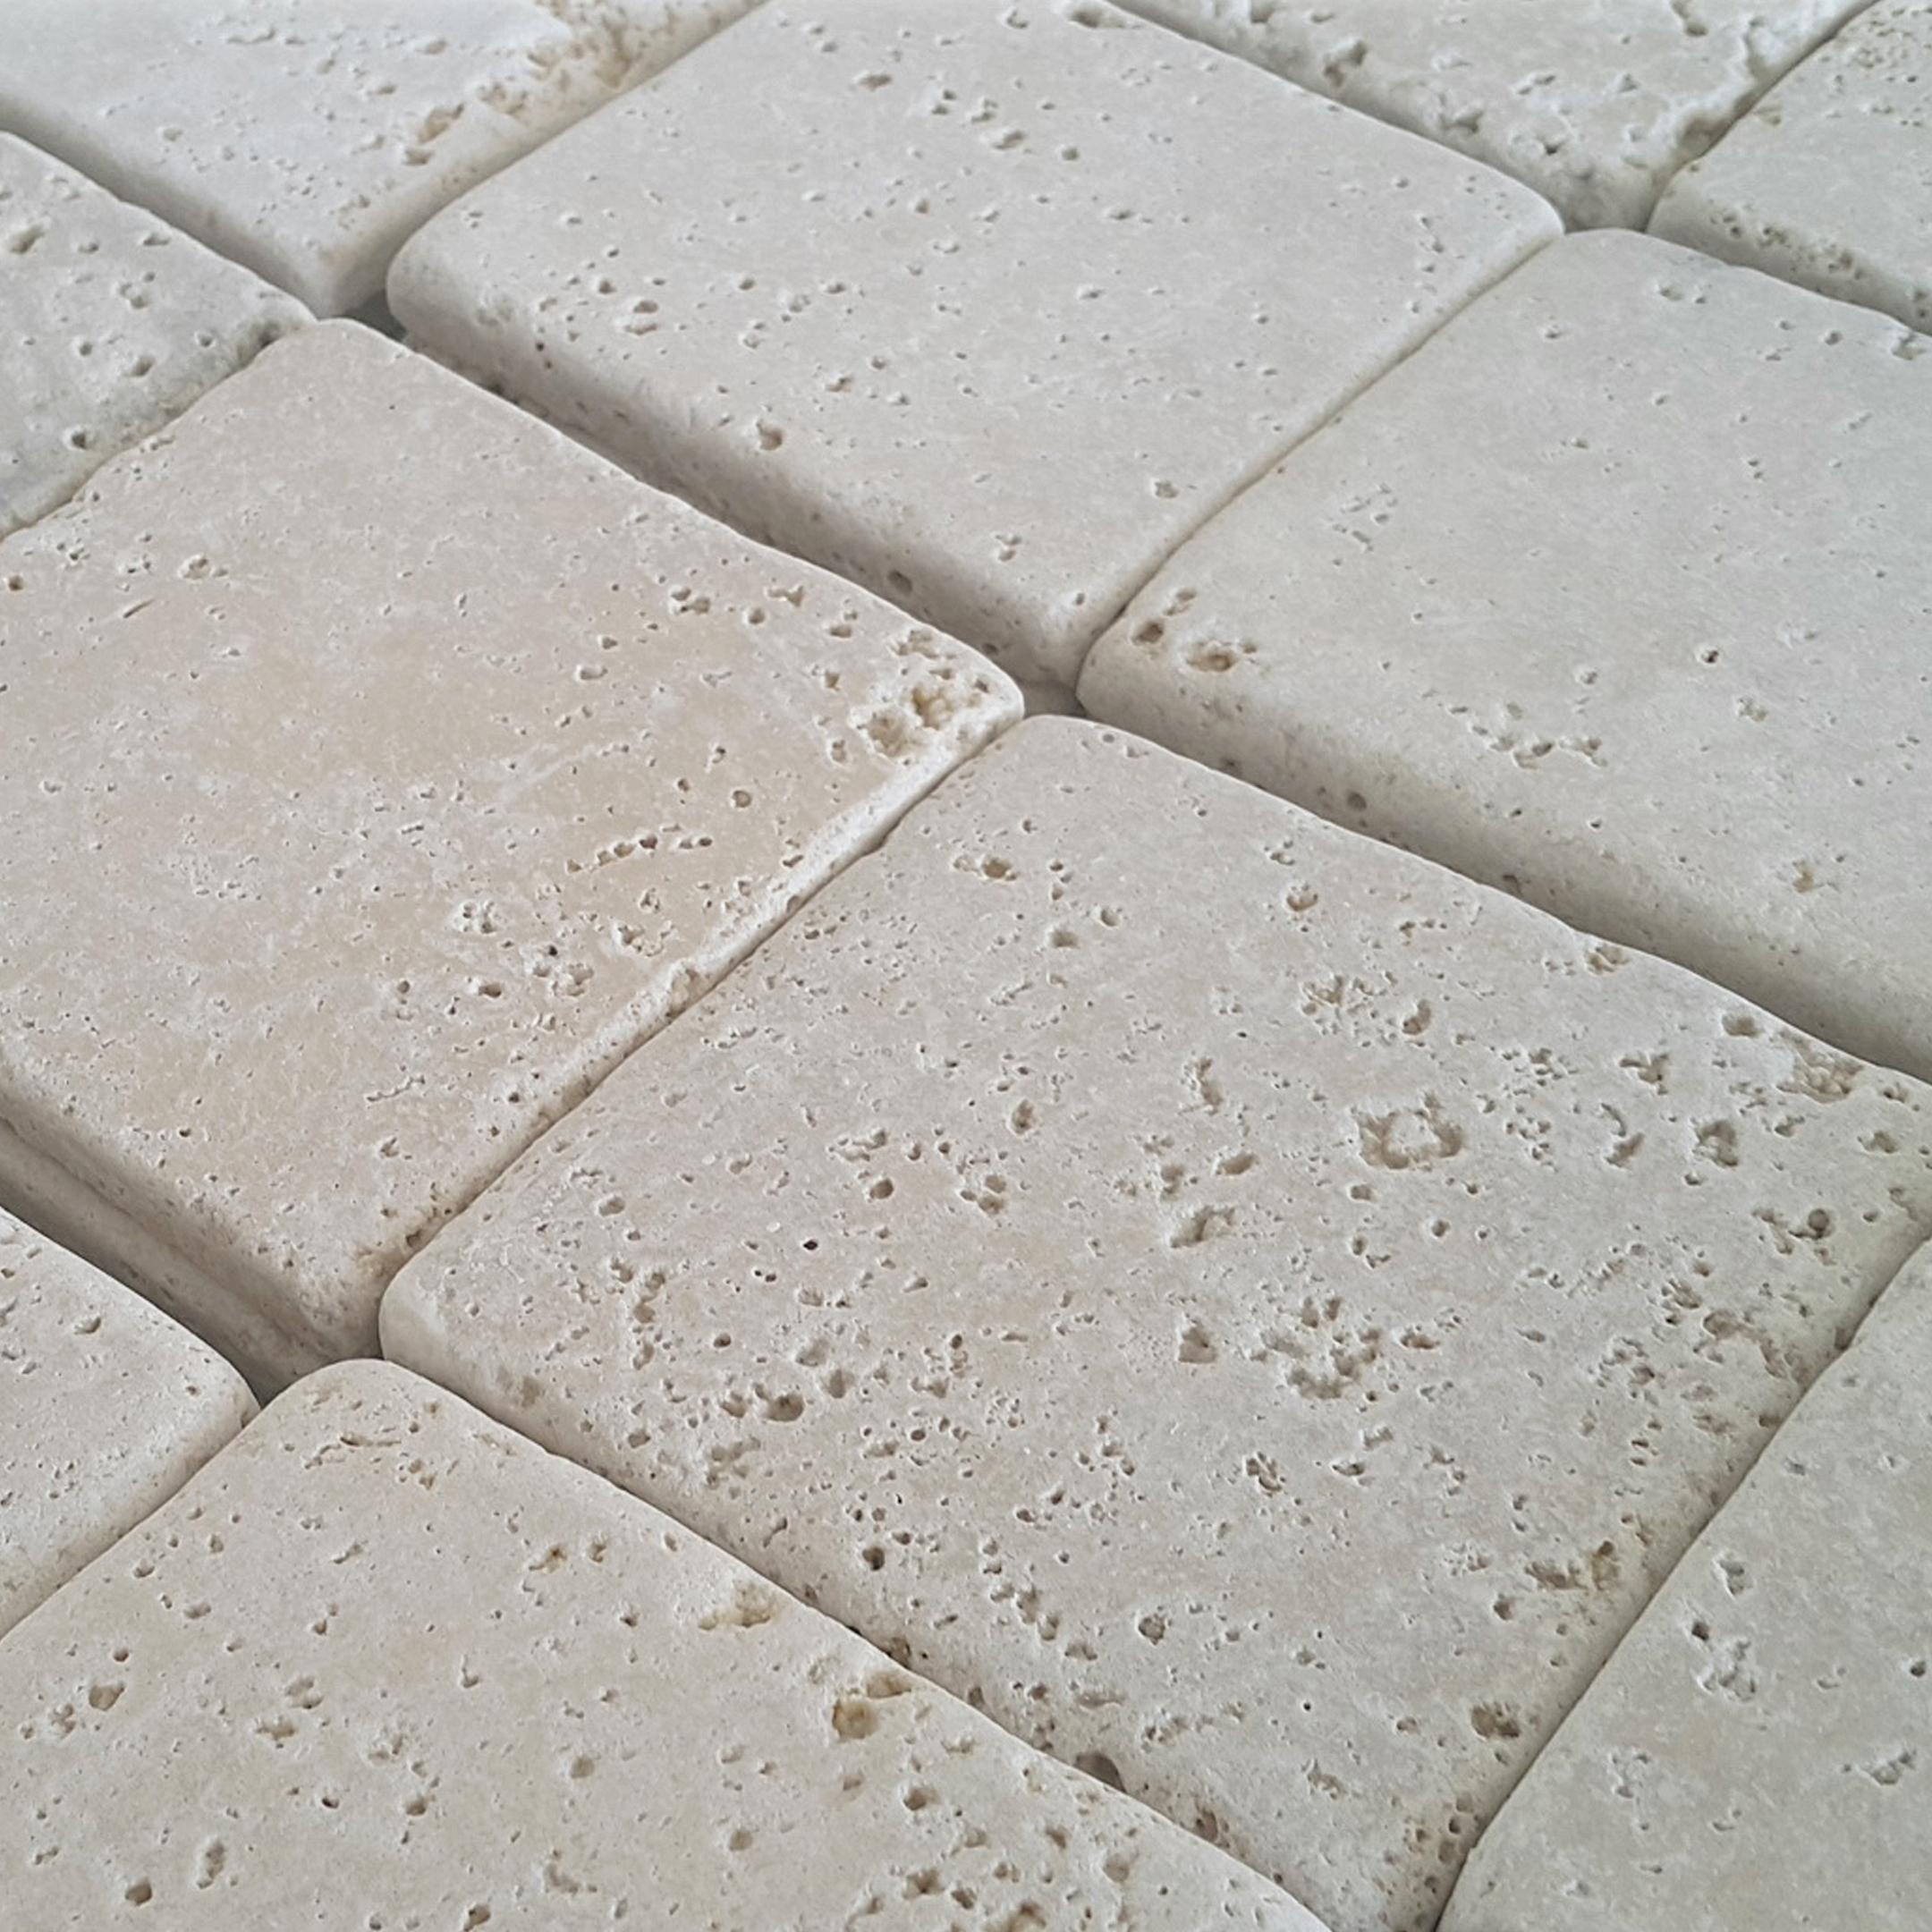 premium select ivory travertine tumbled tile buy travertine tile tumbled ivory tumbled travertine tiles 4x4 tumbled travertine tile ivory